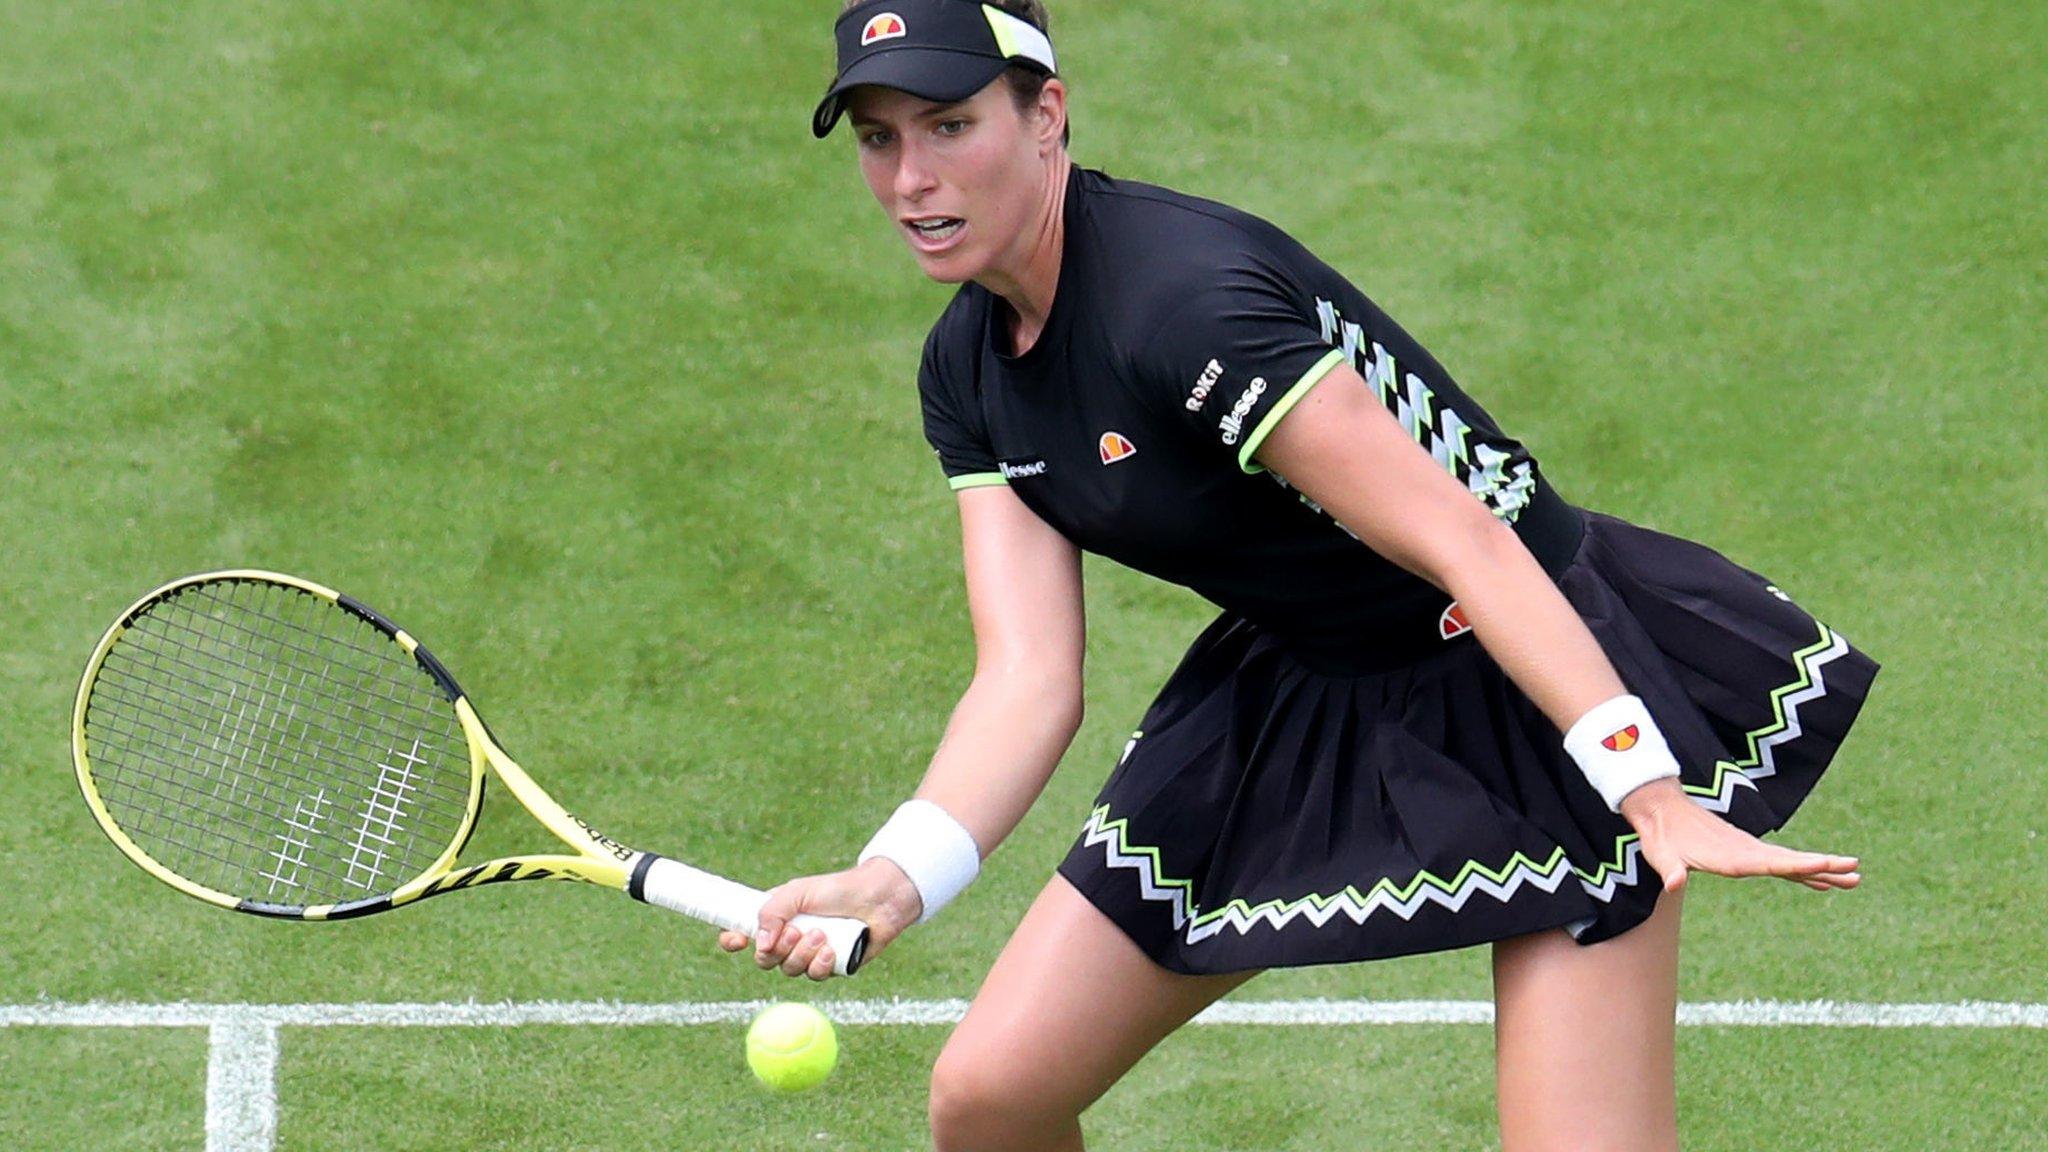 Johanna Konta beats Maria Sakkari to reach Eastbourne third round